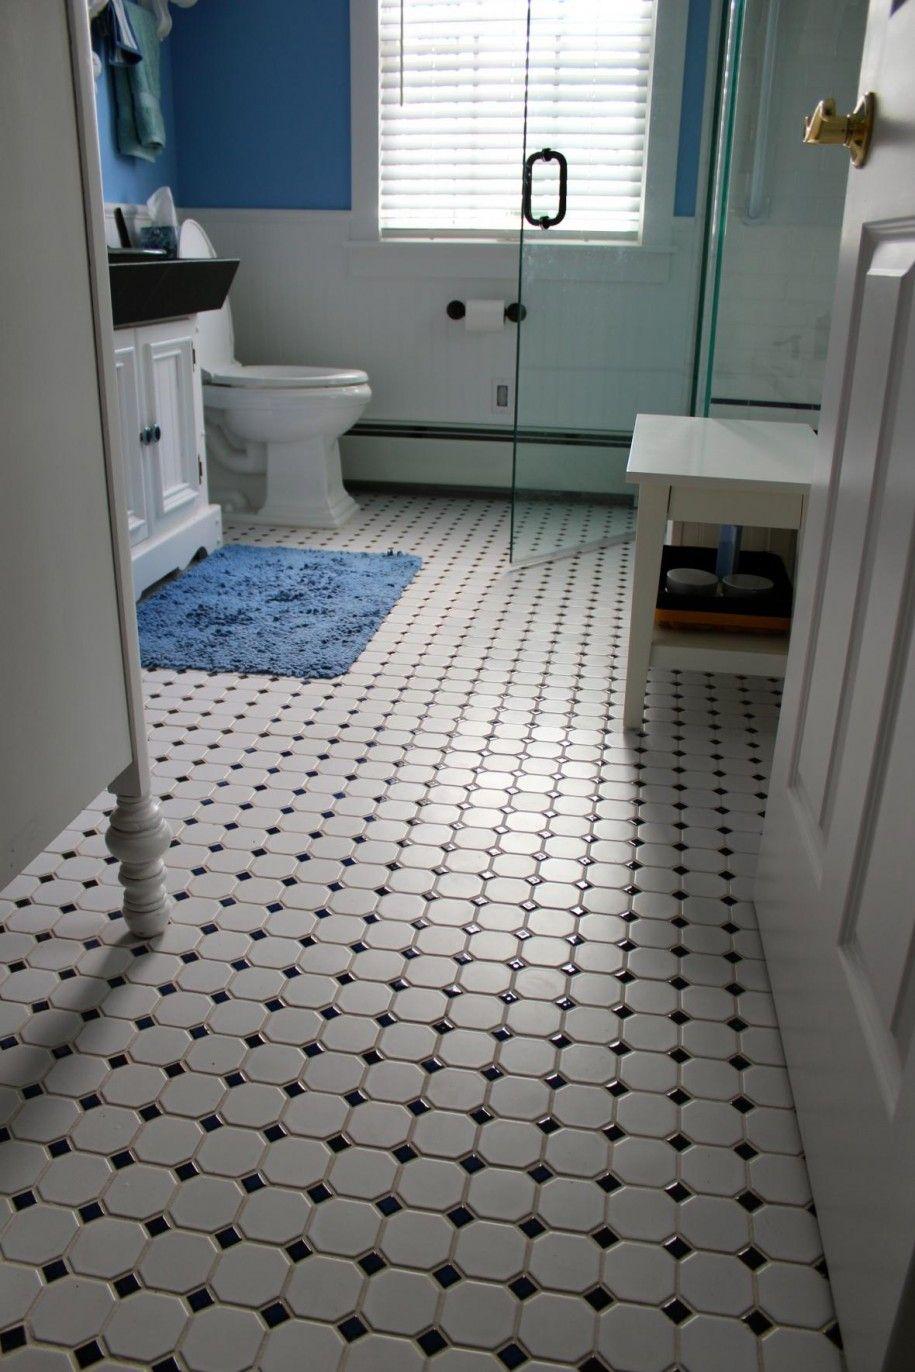 Vintage Bathroom Floor Tiles Design White Wooden Bathroom Closet